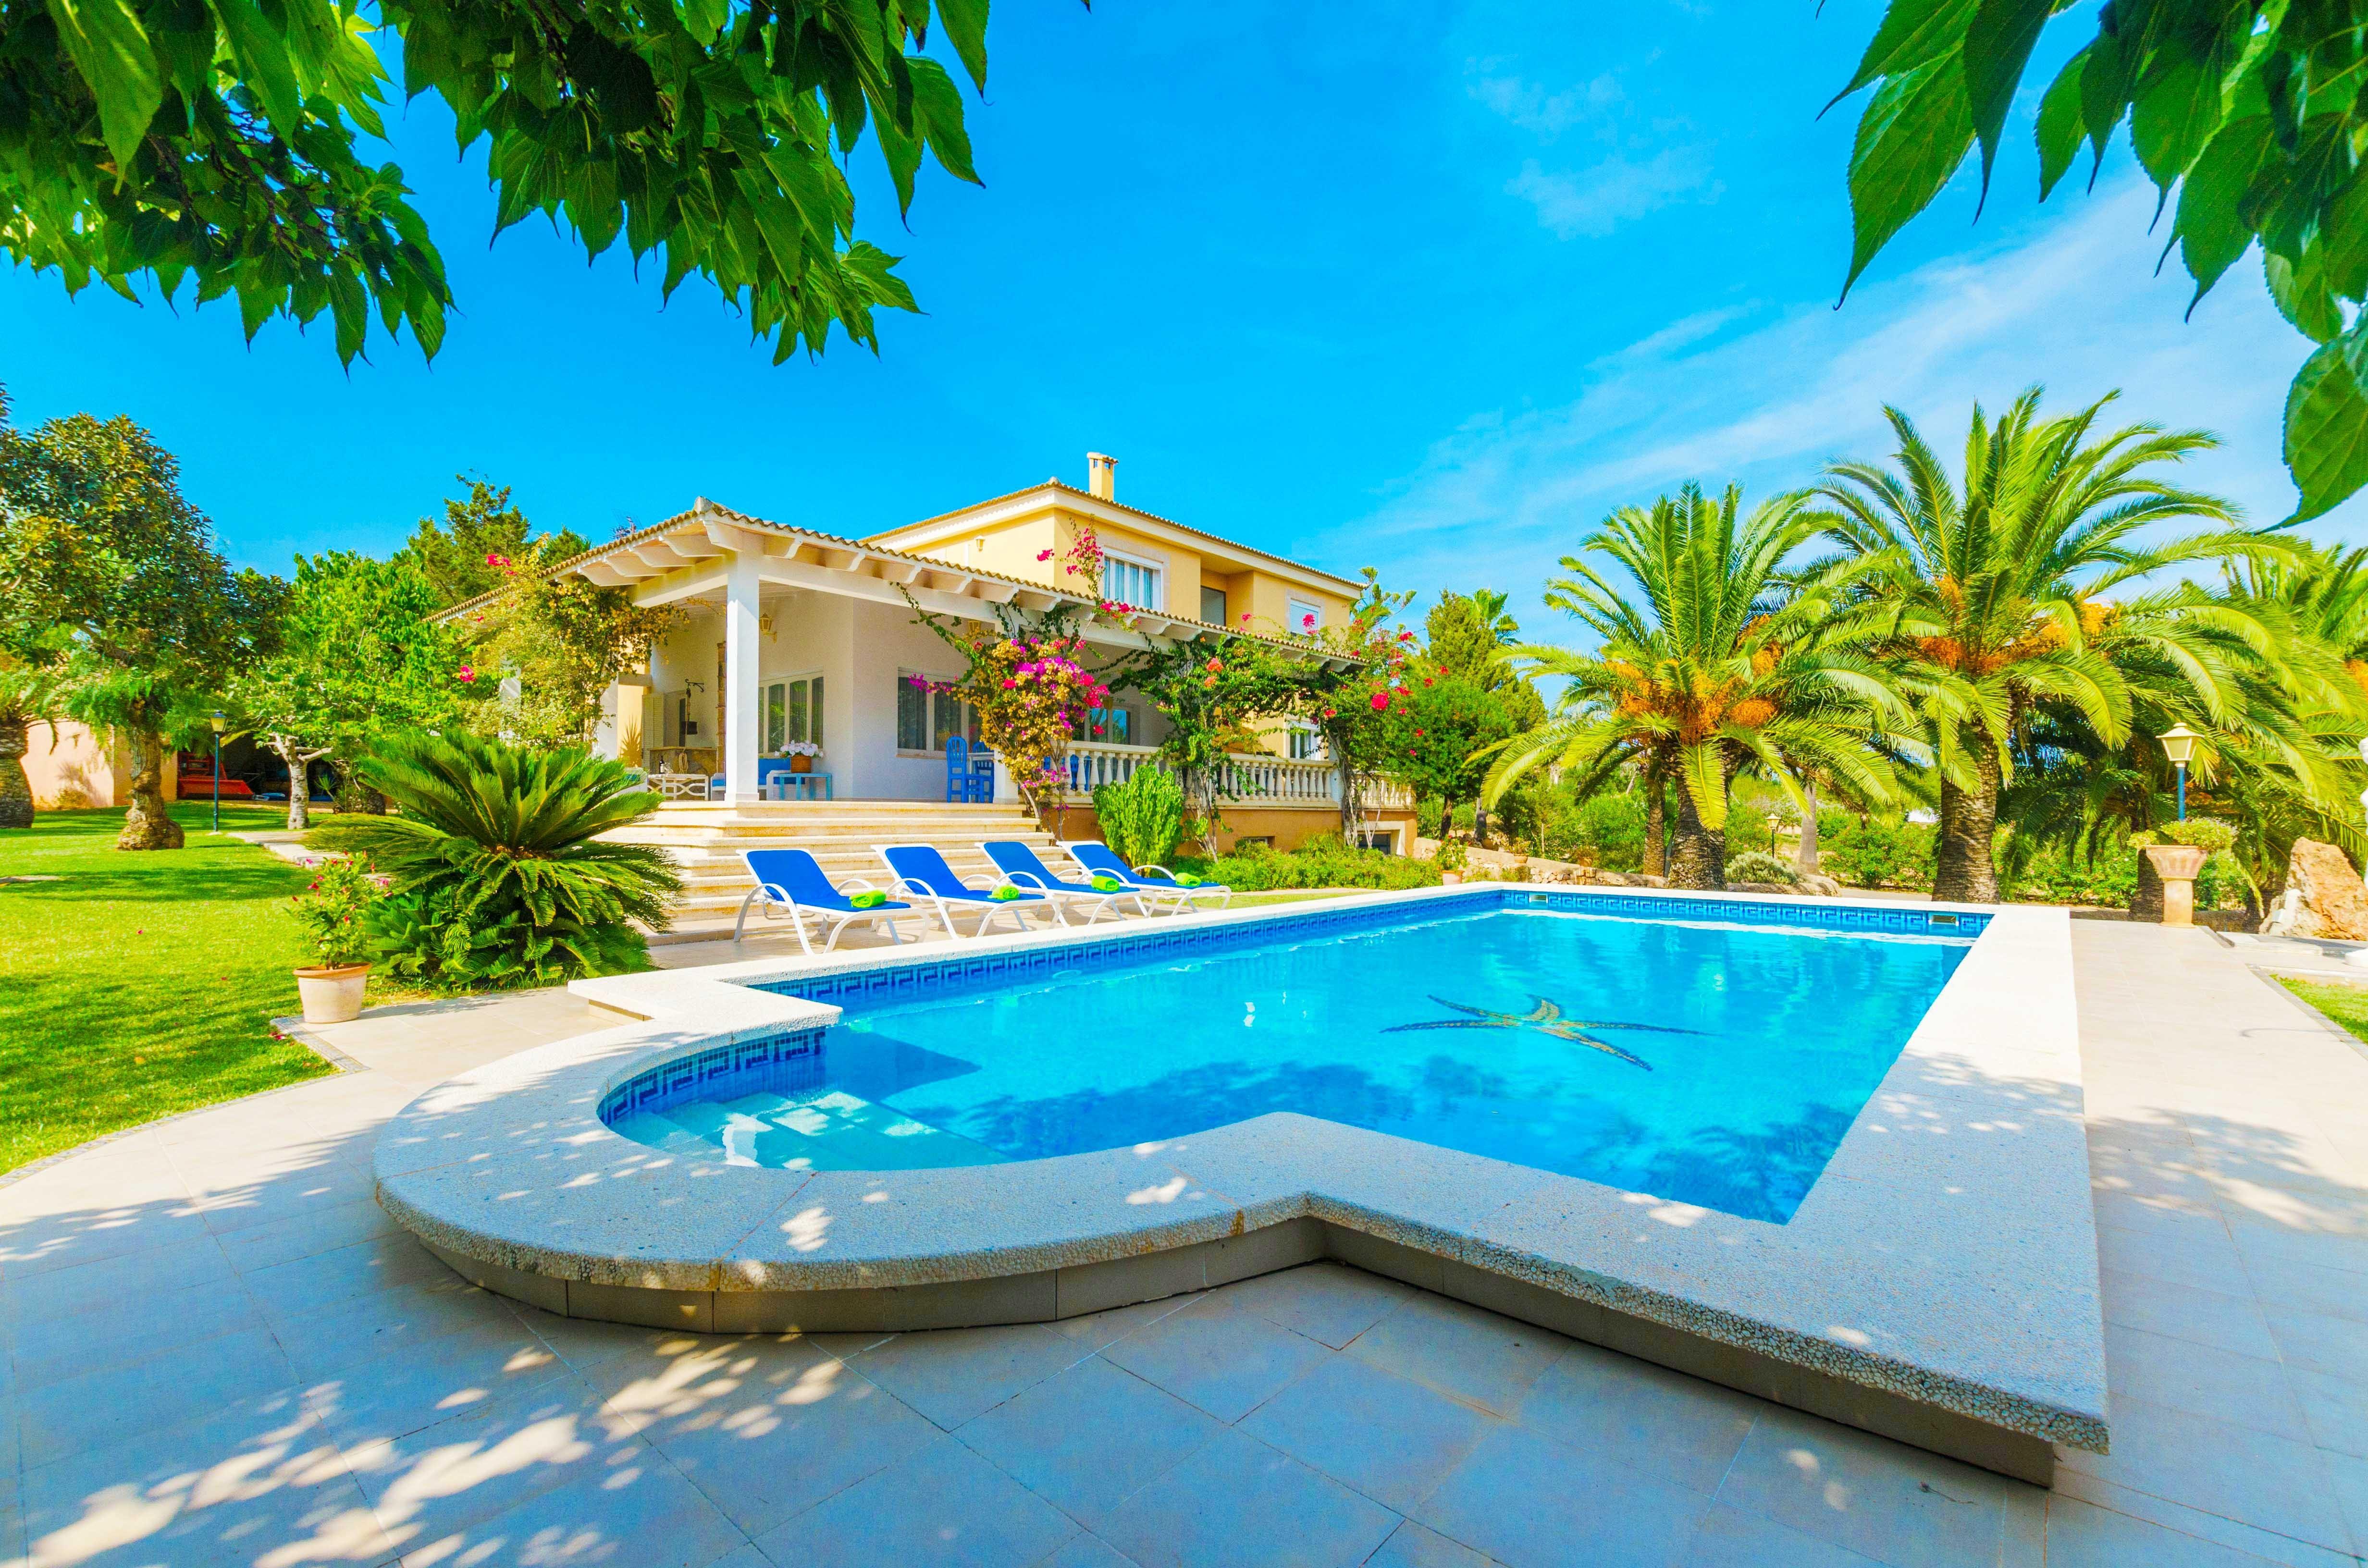 Ferienhaus ses salines 10 personen spanien balearen for Villa bonita precios